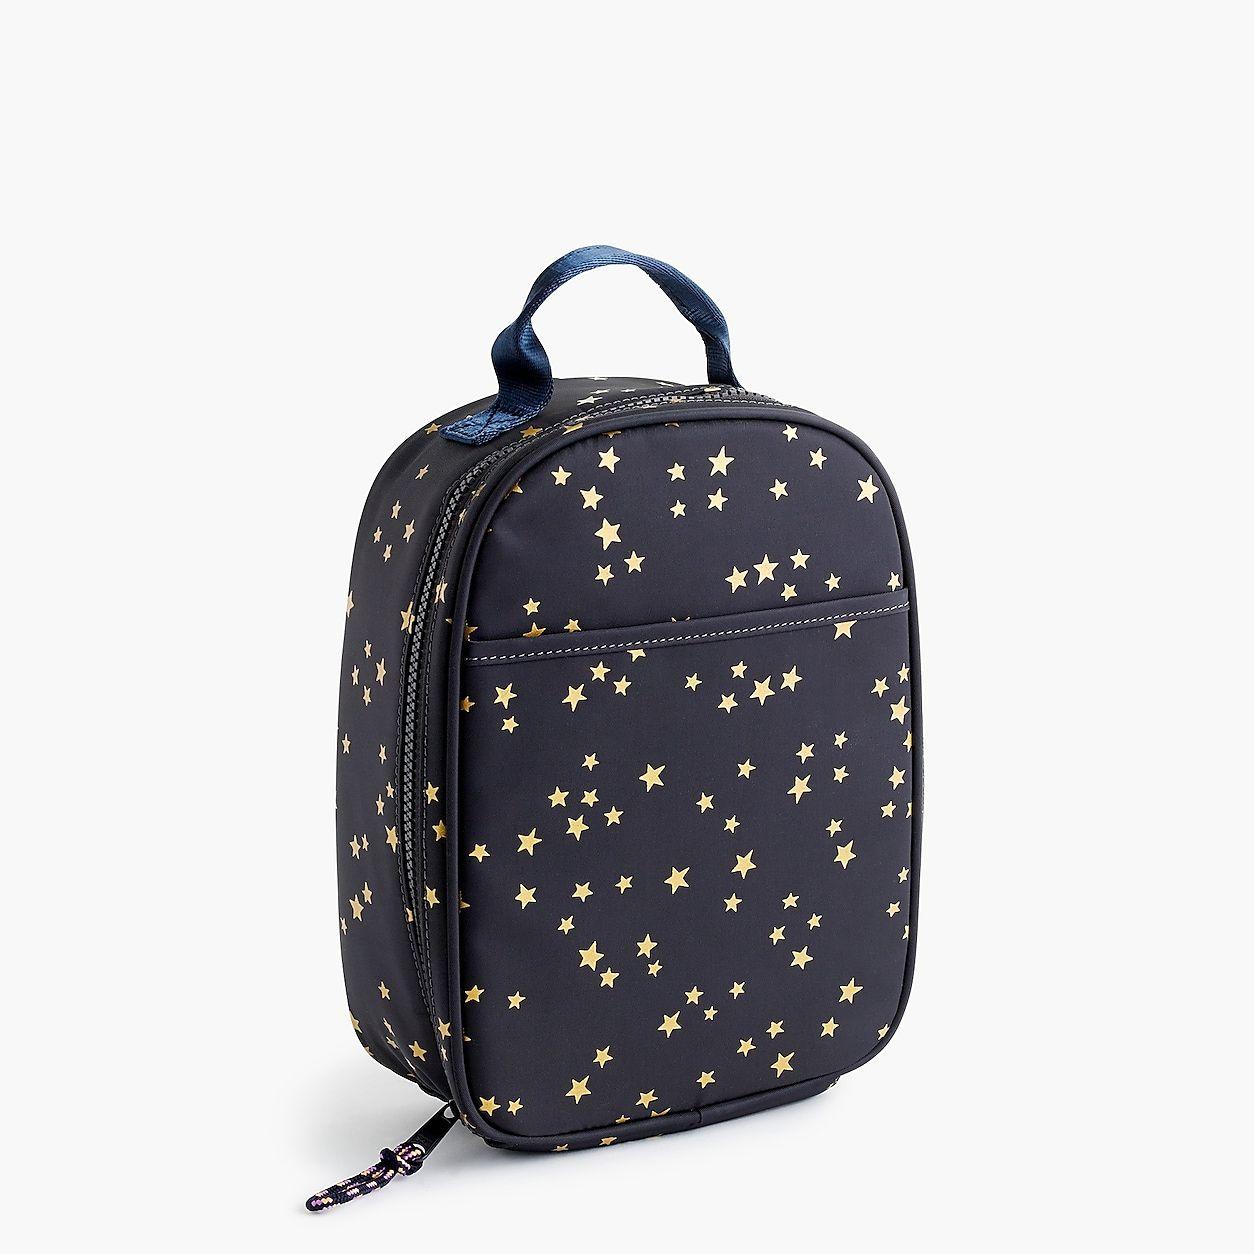 crewcuts Gold Star Lunchbox. crewcuts Gold Star Lunchbox Girls Accessories  ... f133376a92866